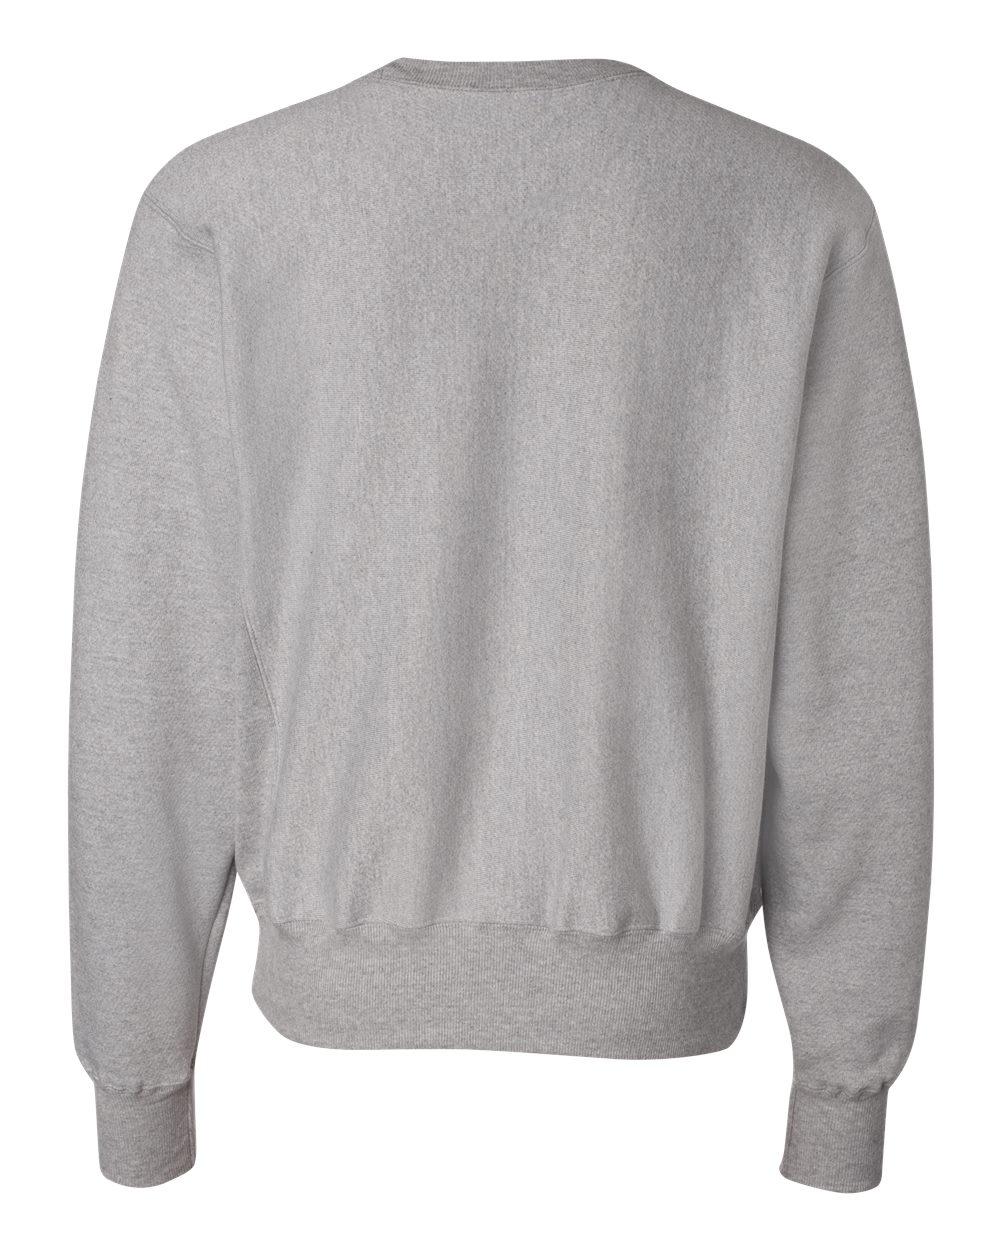 Champion-Mens-Reverse-Weave-Crewneck-Sweatshirt-Blank-Solid-S149-up-to-3XL thumbnail 13